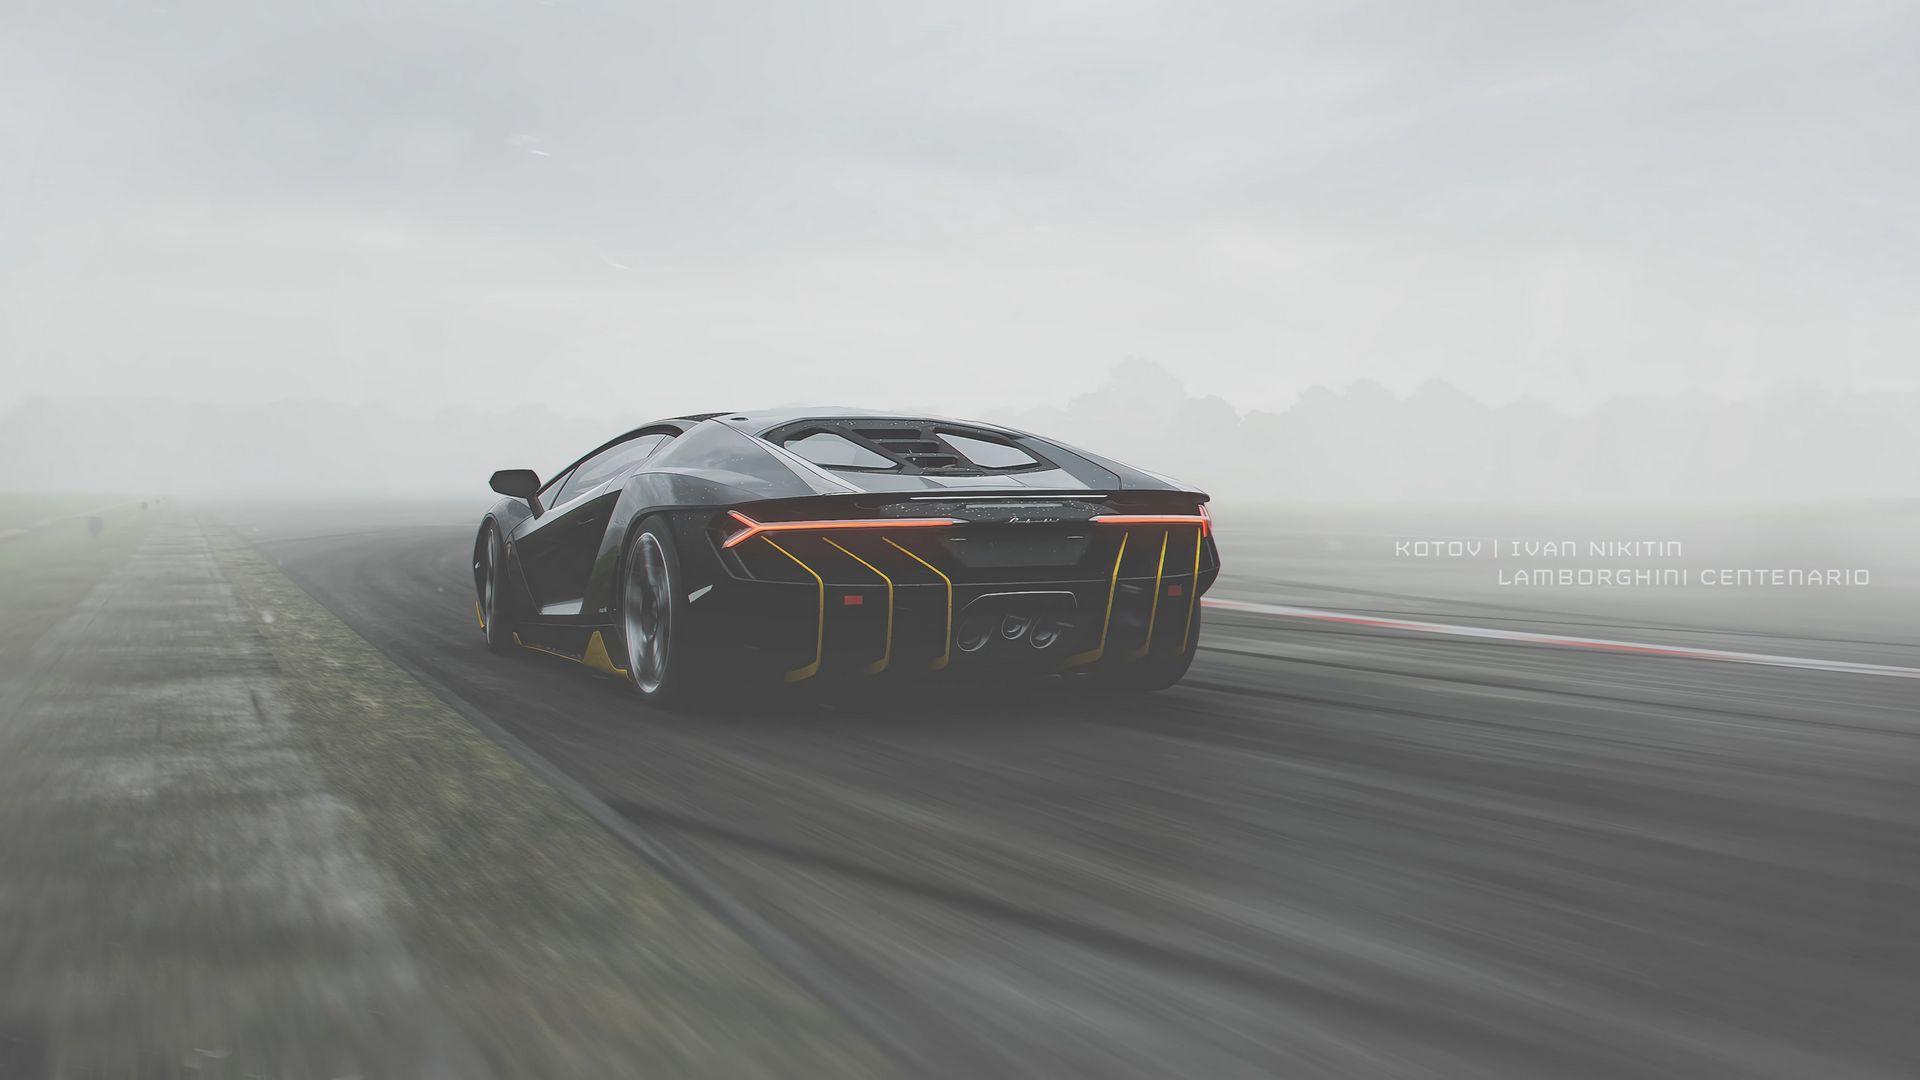 The Wallpapers Related to Lamborghini, Centenario, Lamborghini, Sportscar